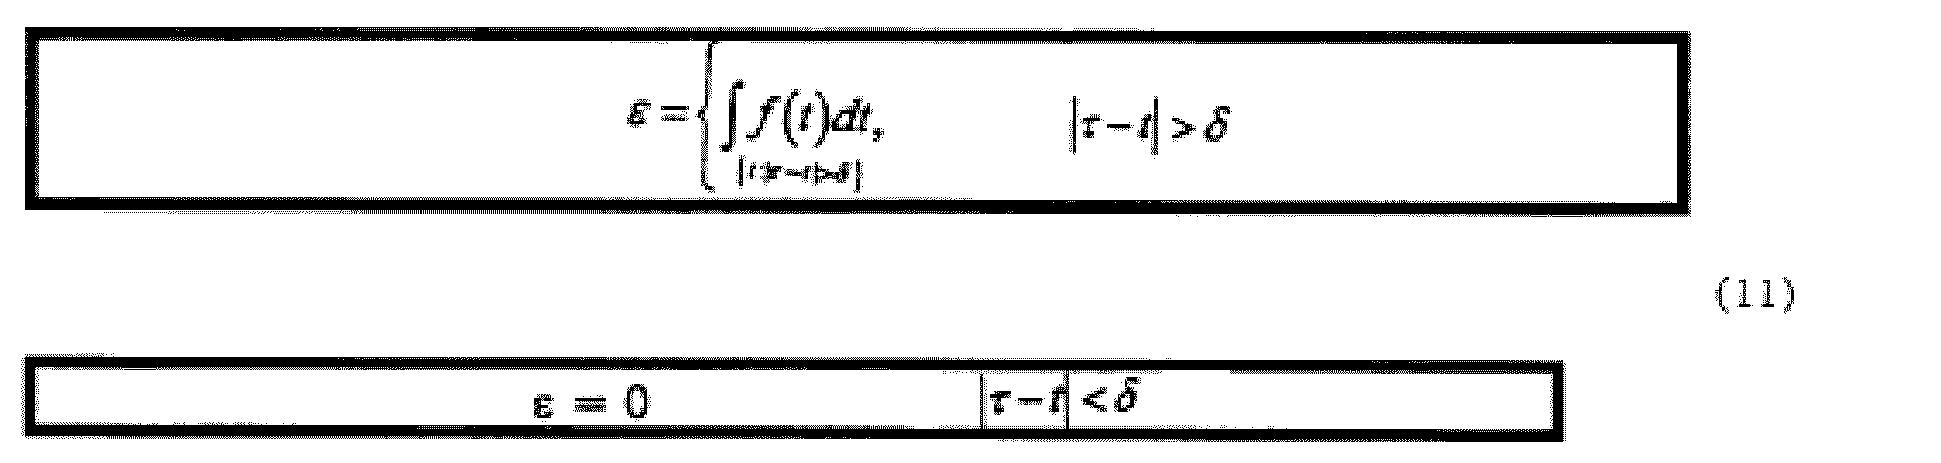 Fi125333b The Cdma Modem Google Patents Adjustment Power Supply Values 12515v Max Current 05 Amps Figure Fi125333bd00281